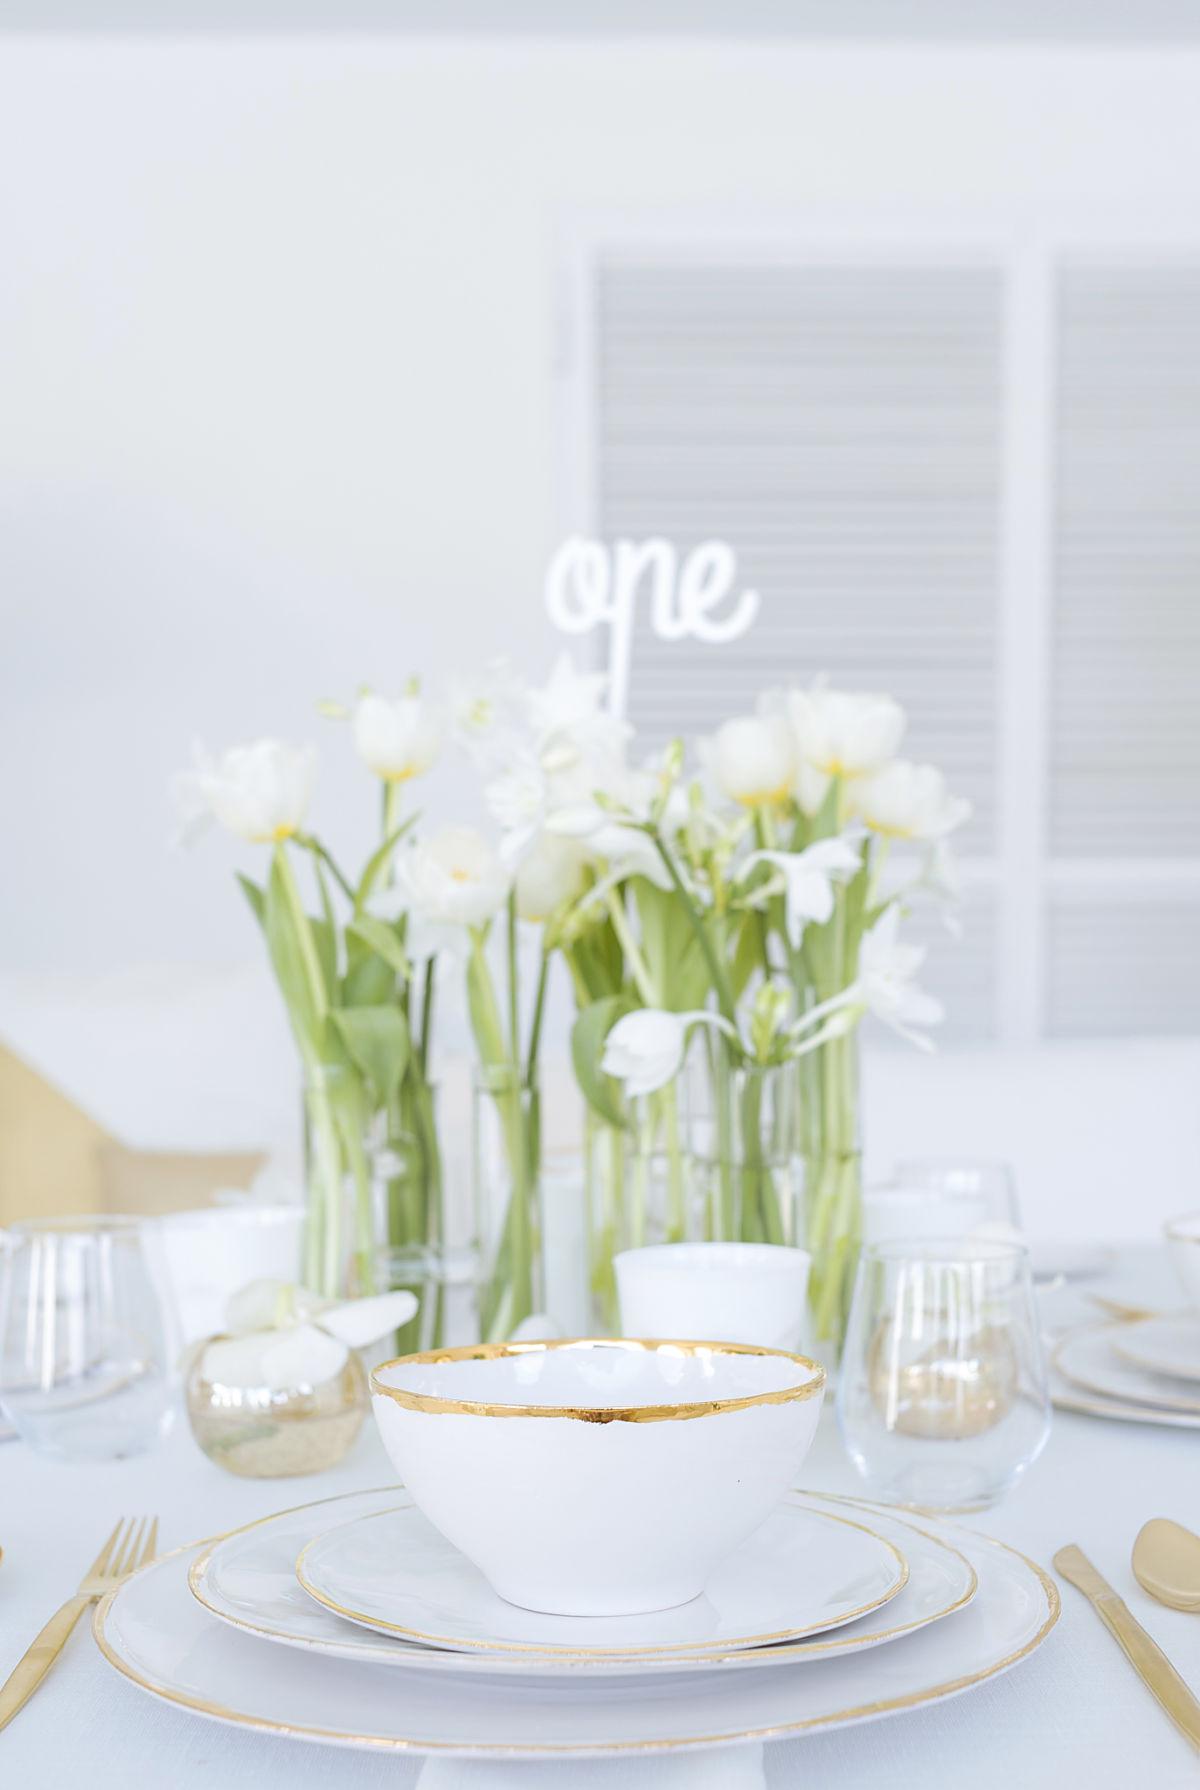 calista-one-lista-de-bodas-online-blog-de-bodas-decoracion-mesa-blanco-y-dorado-2